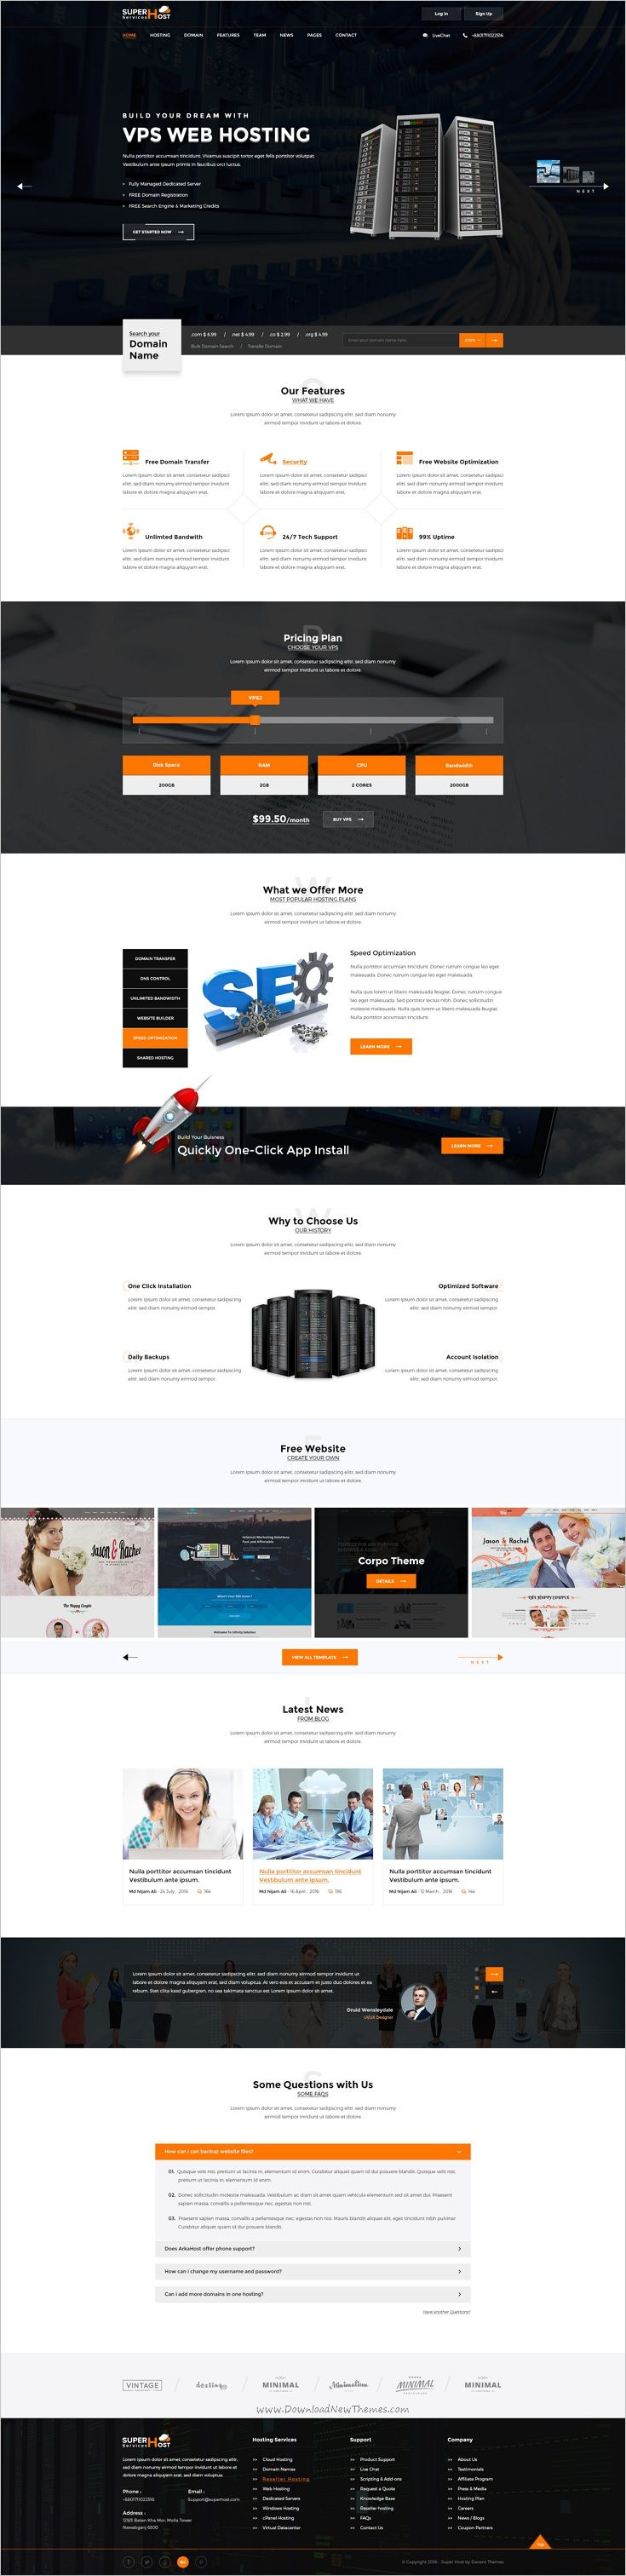 wedding invitation template themeforest%0A Super Host  Premium Web Hosting PSD Template